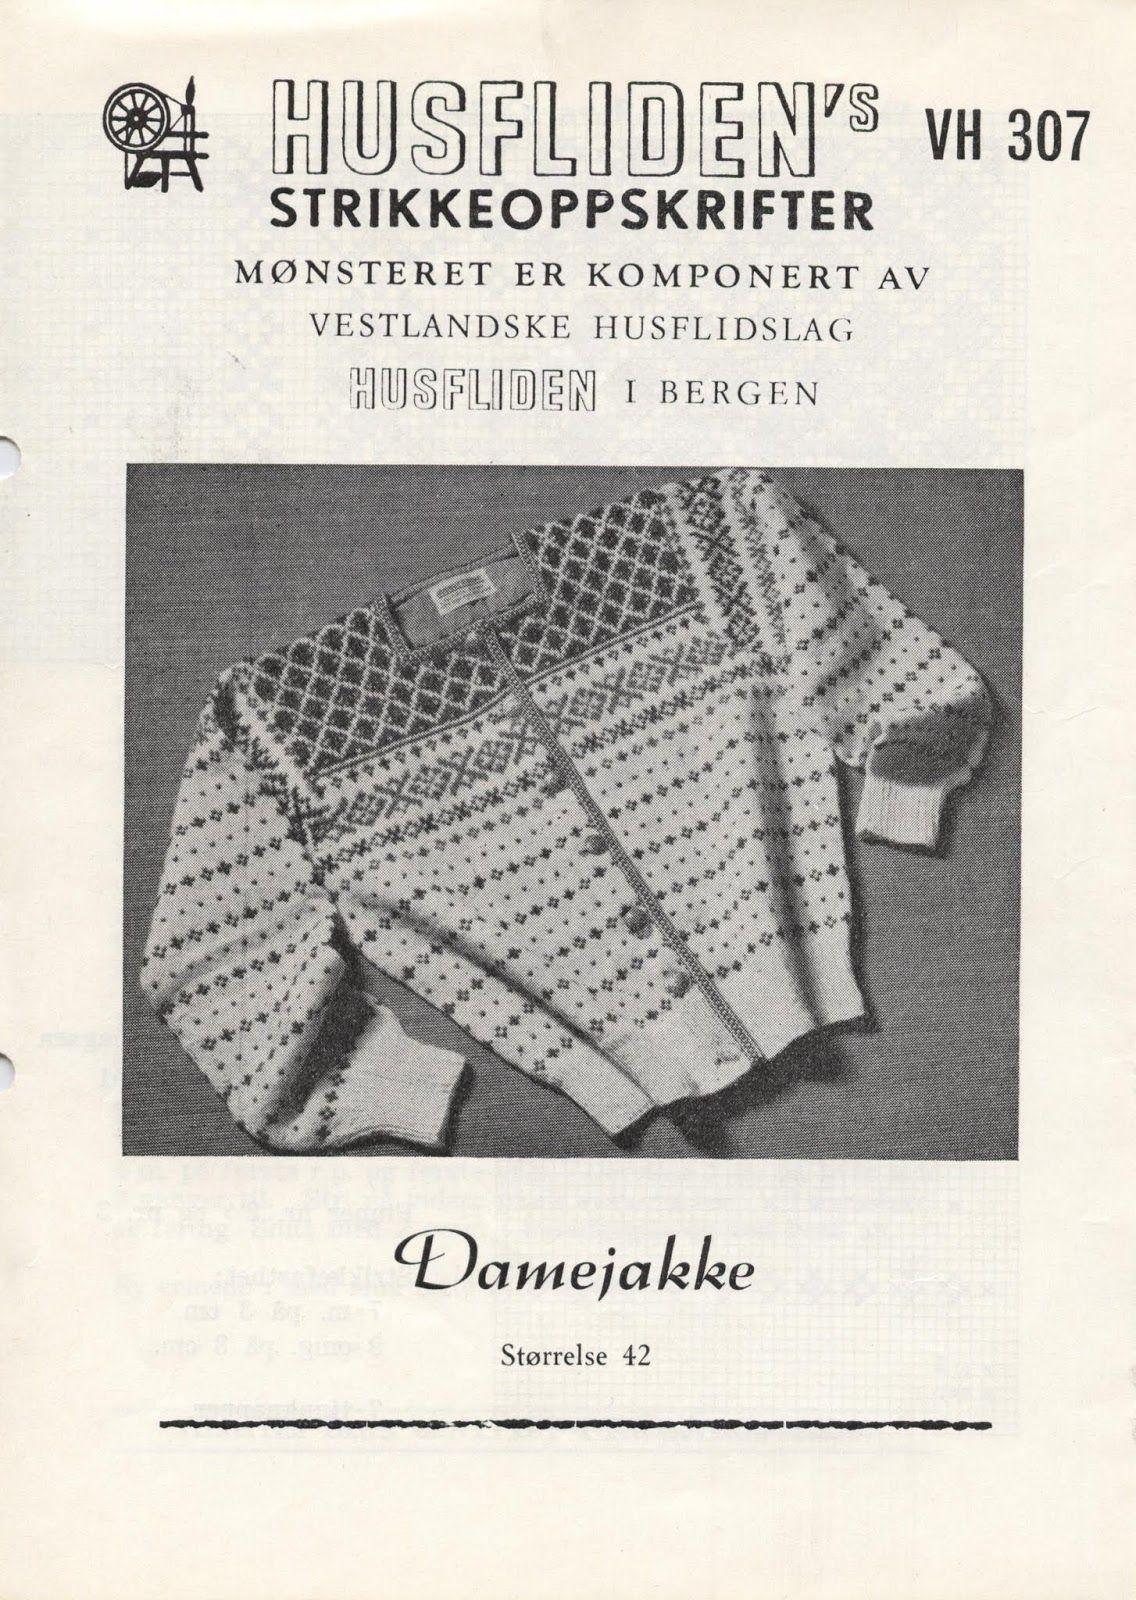 Photo of Husfliden VH 307 Damejakke